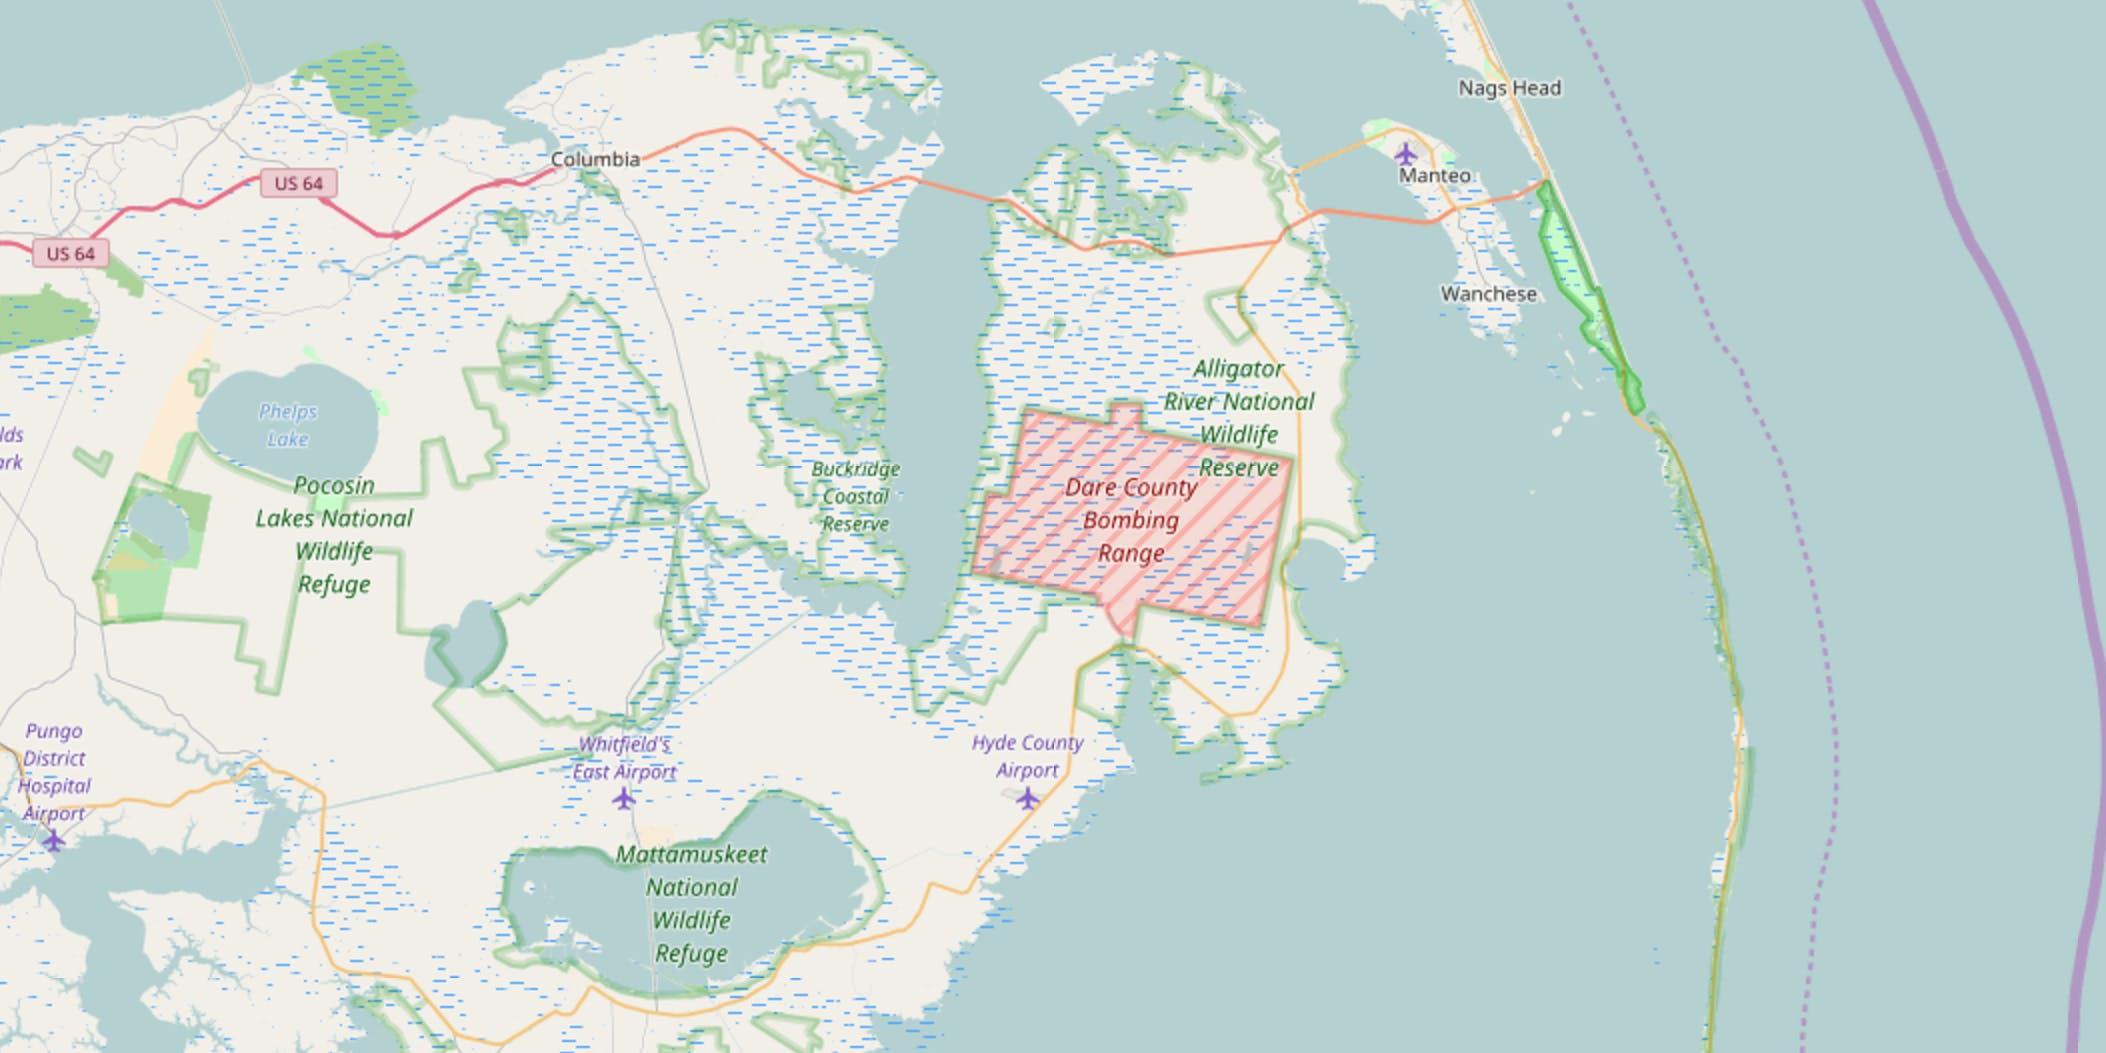 dare country bombing range on faa map